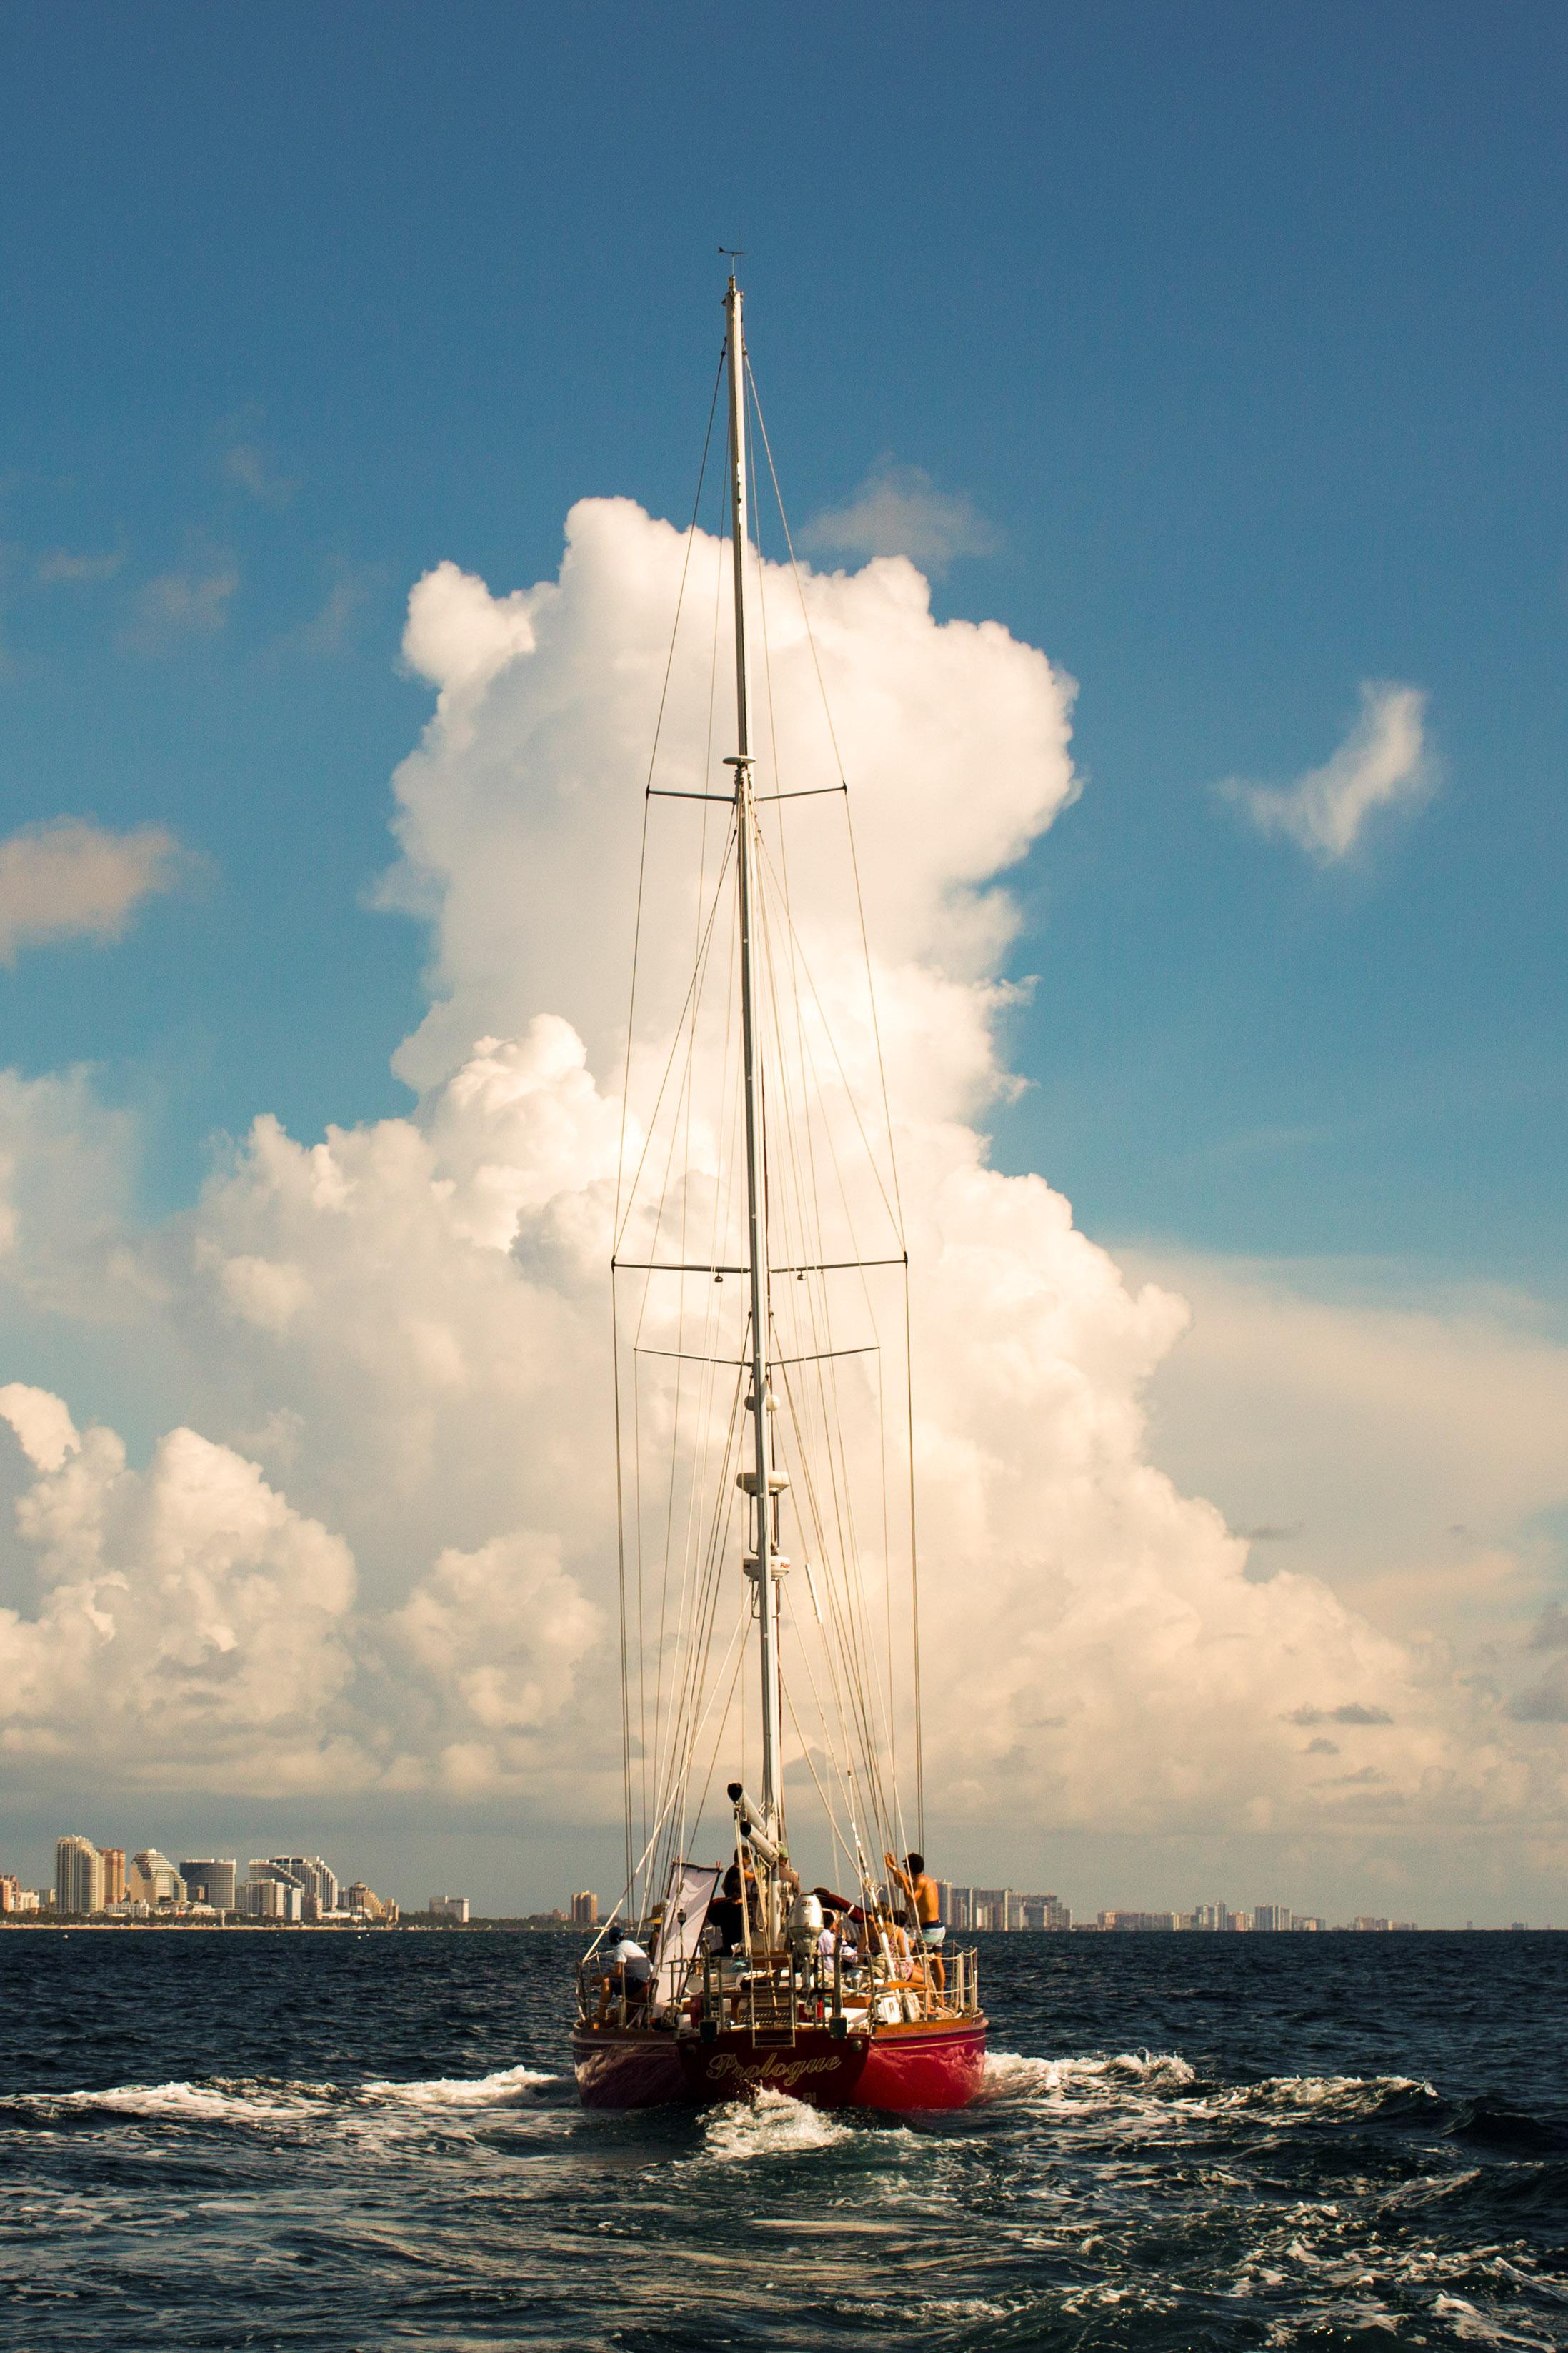 DGordin_000000_Nautica_FLL_0008.jpg